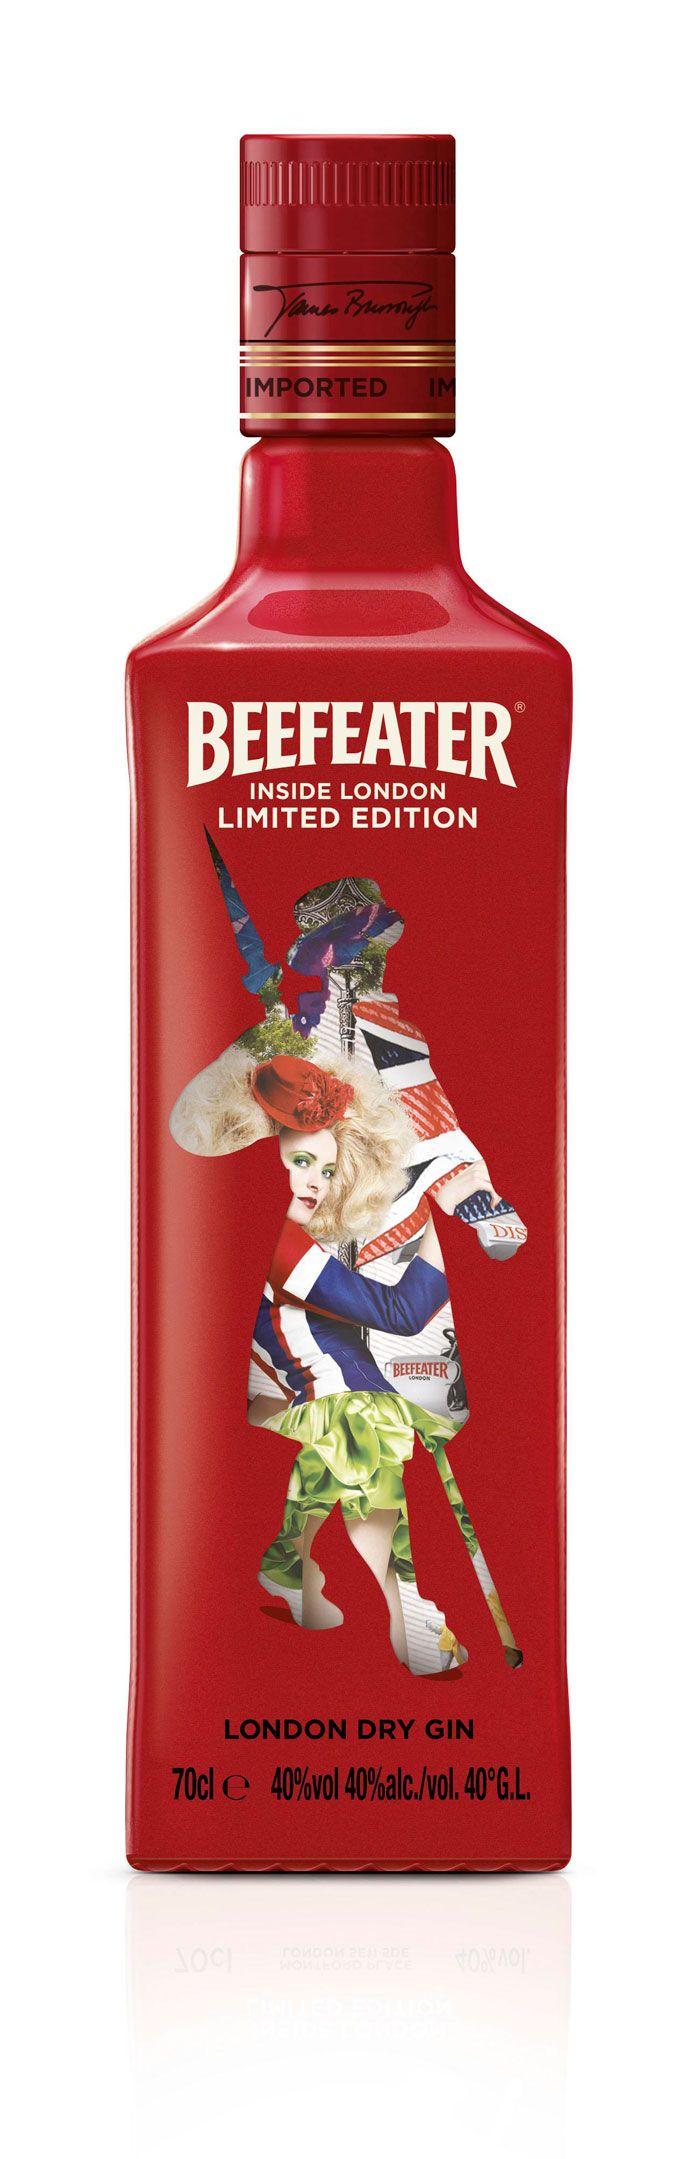 Beefeater Gin Inside London Gin Gin Bottles Beefeater